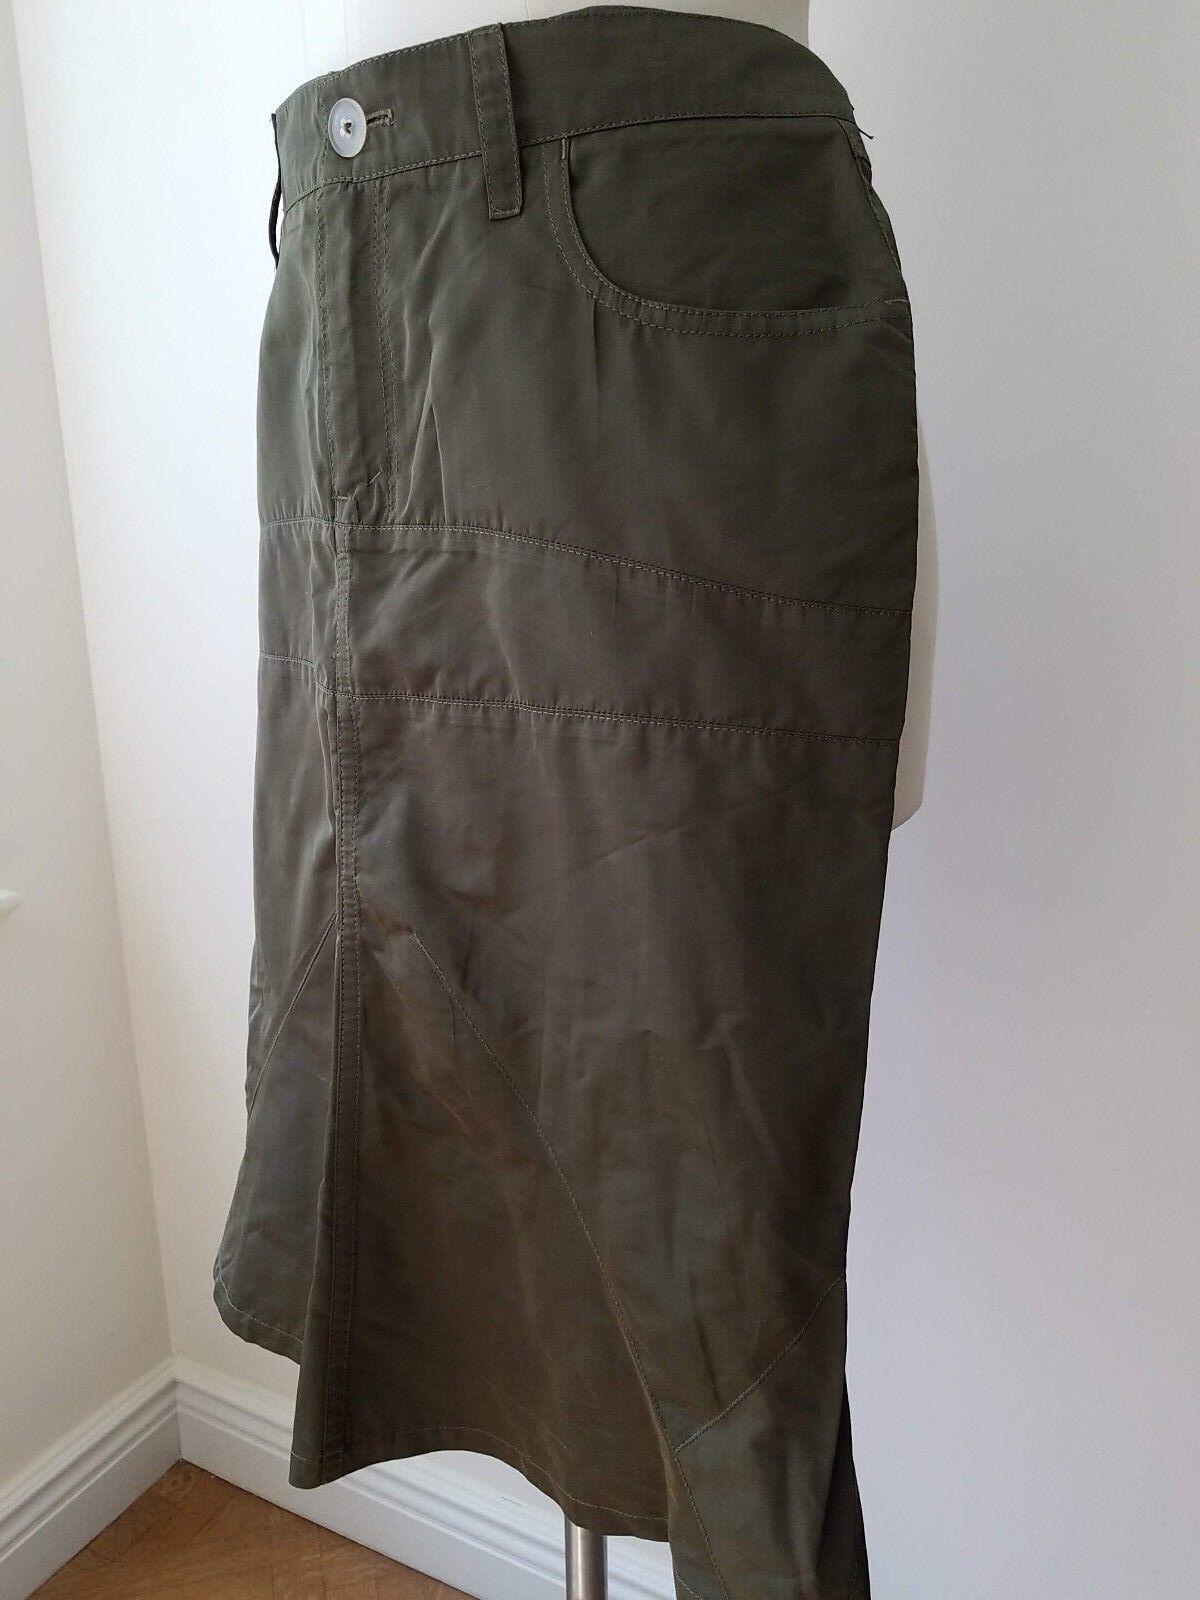 Jil Sander Dark Khaki-Green Polyester & Silk Skirt Sz. 40 (8)